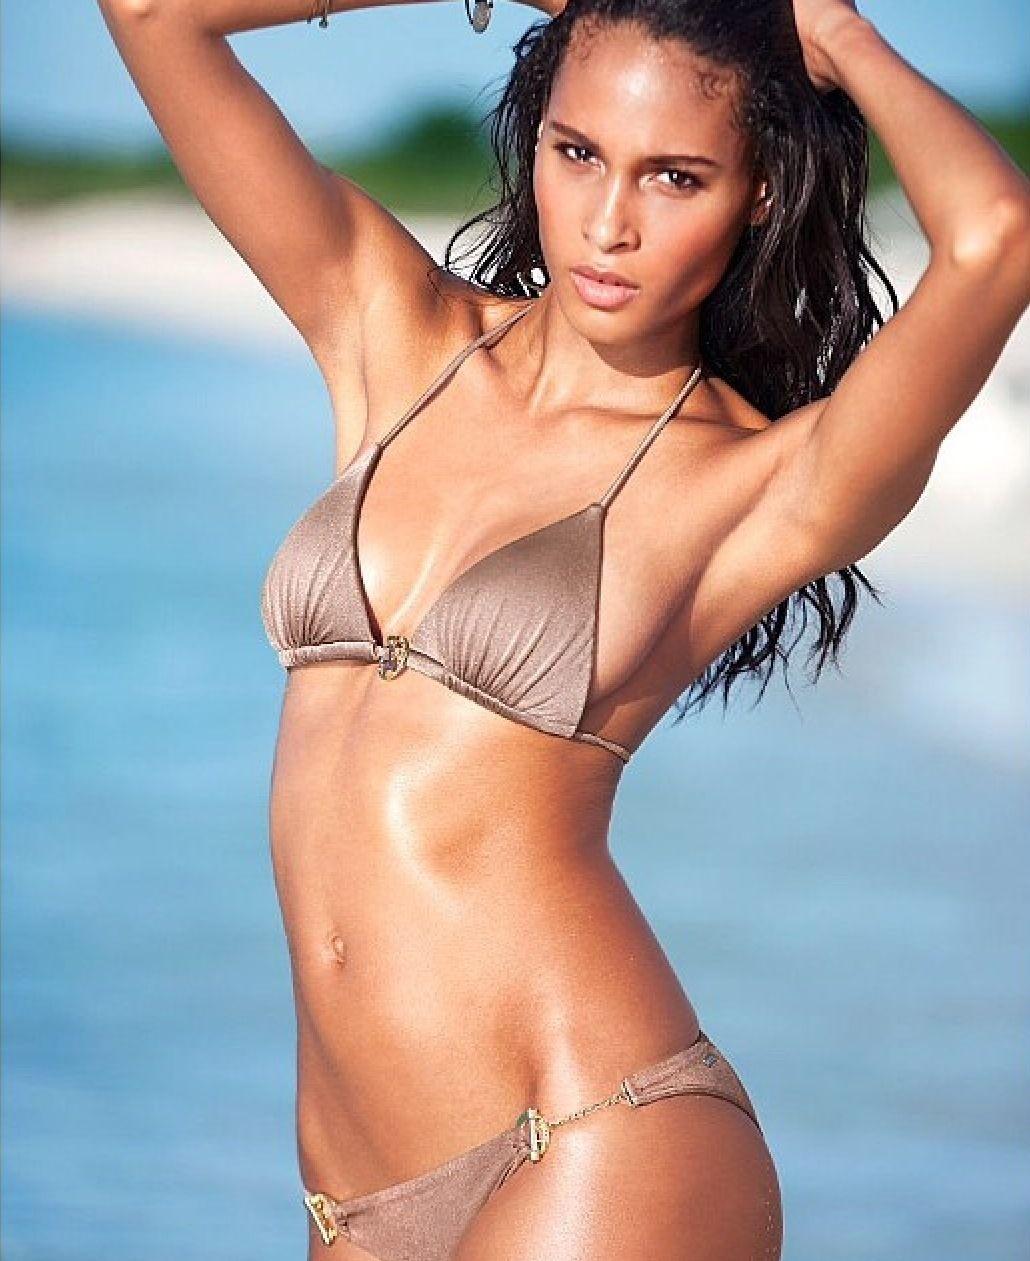 Bikini Cindy Bruna ) nudes (99 foto and video), Sexy, Paparazzi, Instagram, swimsuit 2019